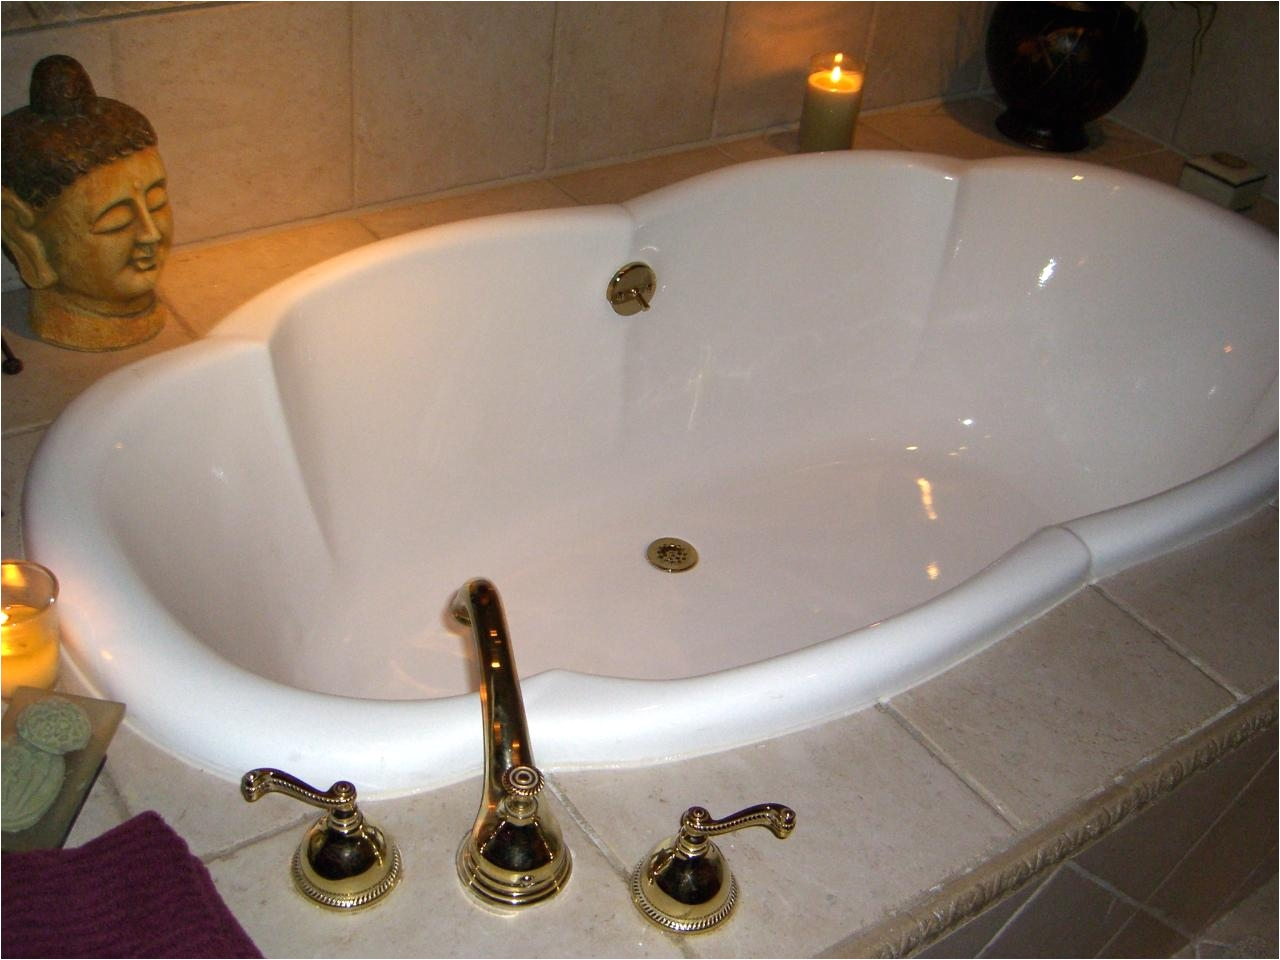 atlanta bath tub reglazing tub resurfacing bathroom bathtub reglazing tile resurfacing porcelain tub reglazing clawfoot bathtub reglazing 36